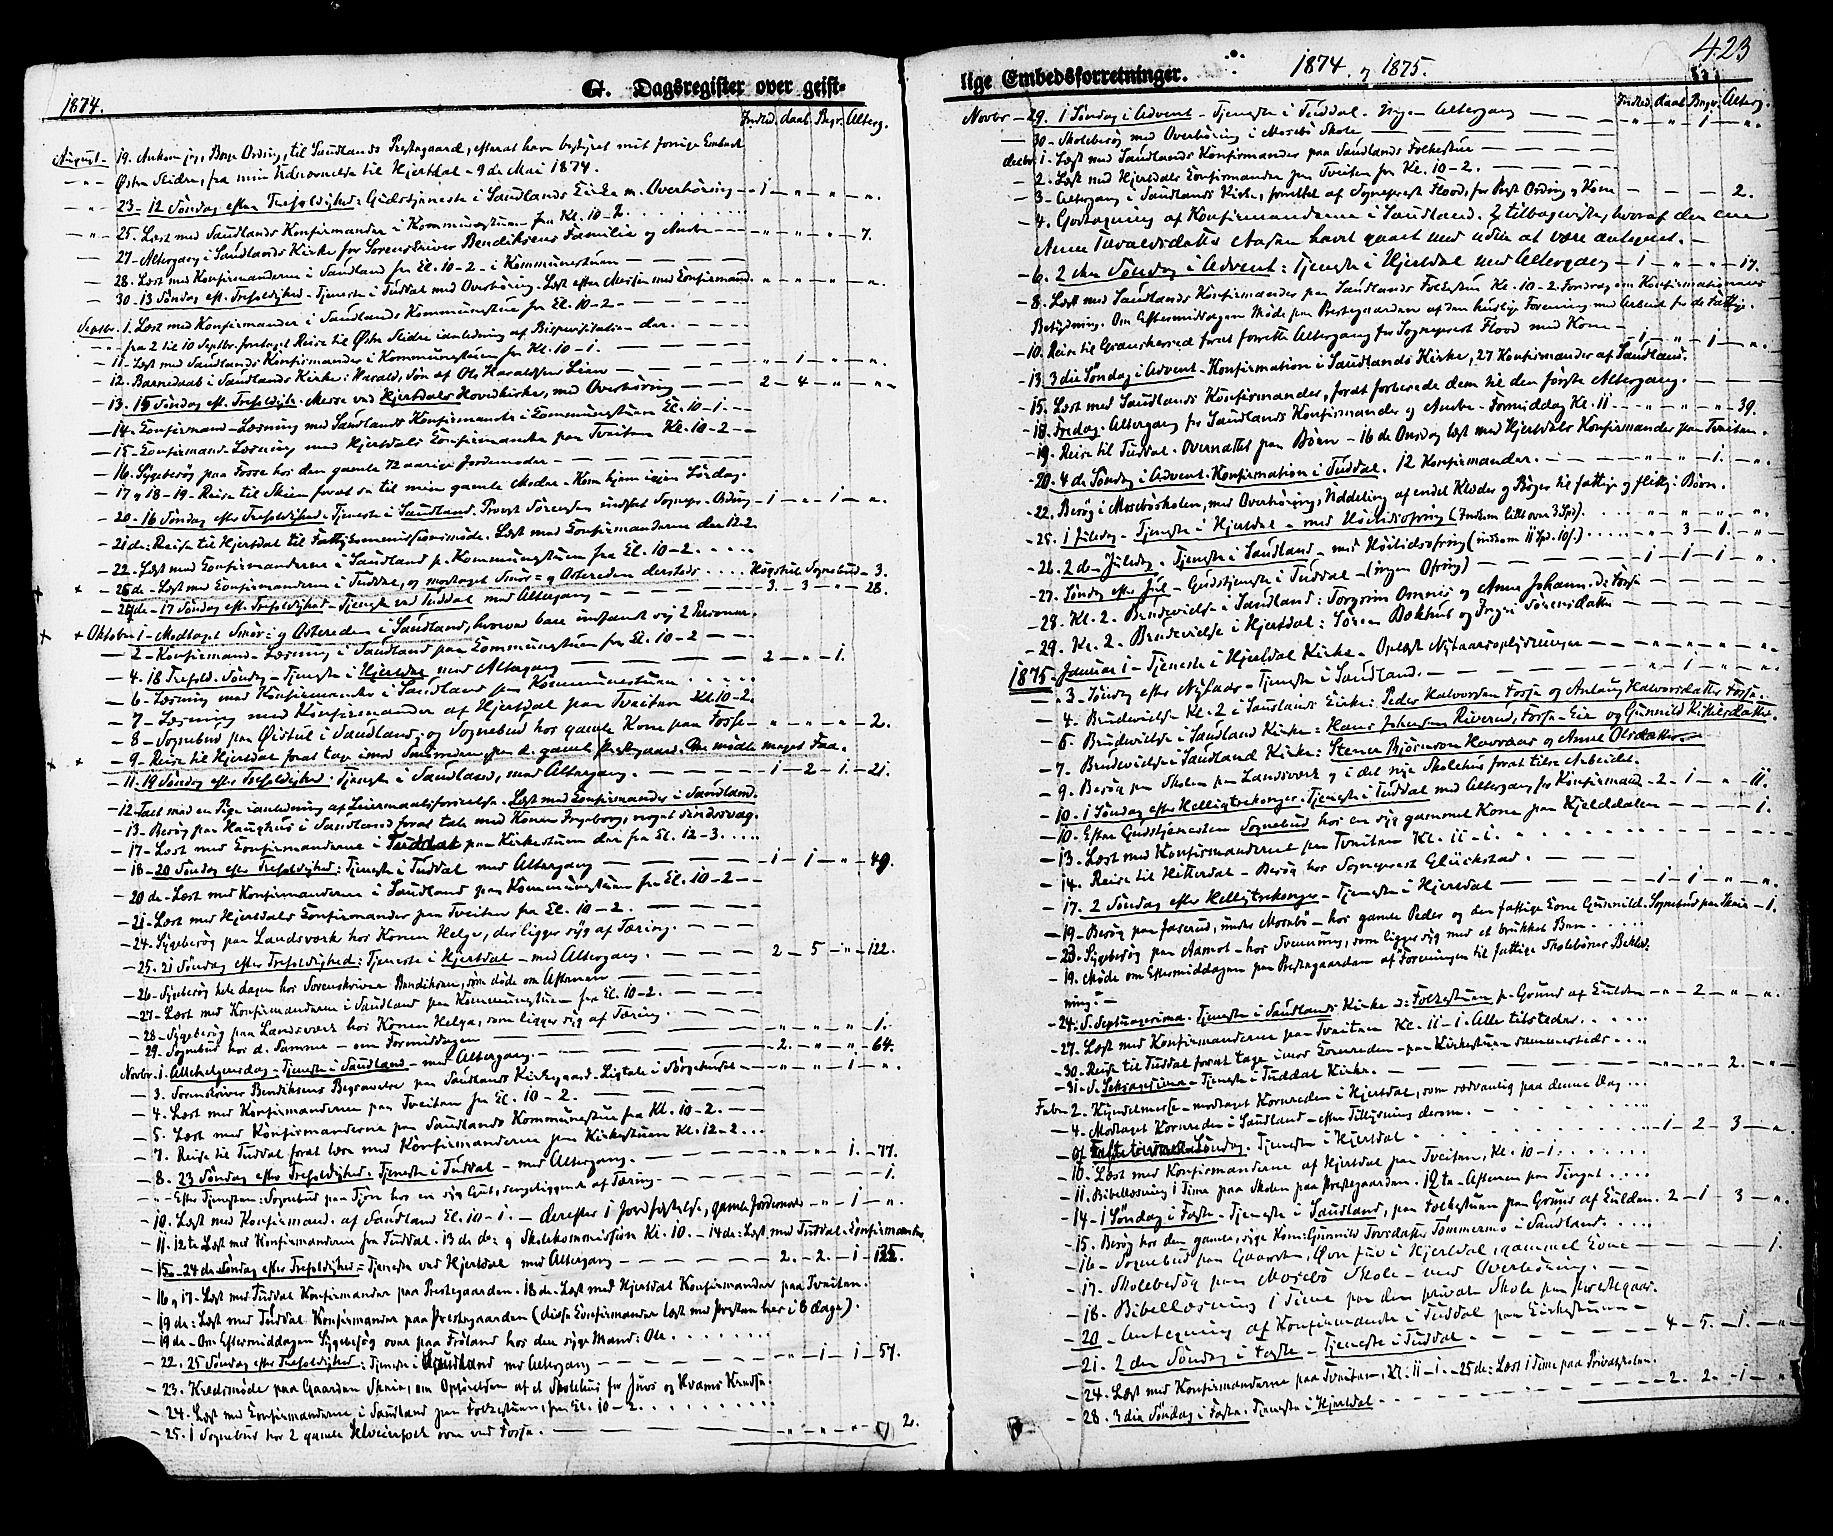 SAKO, Hjartdal kirkebøker, F/Fa/L0009: Ministerialbok nr. I 9, 1860-1879, s. 423